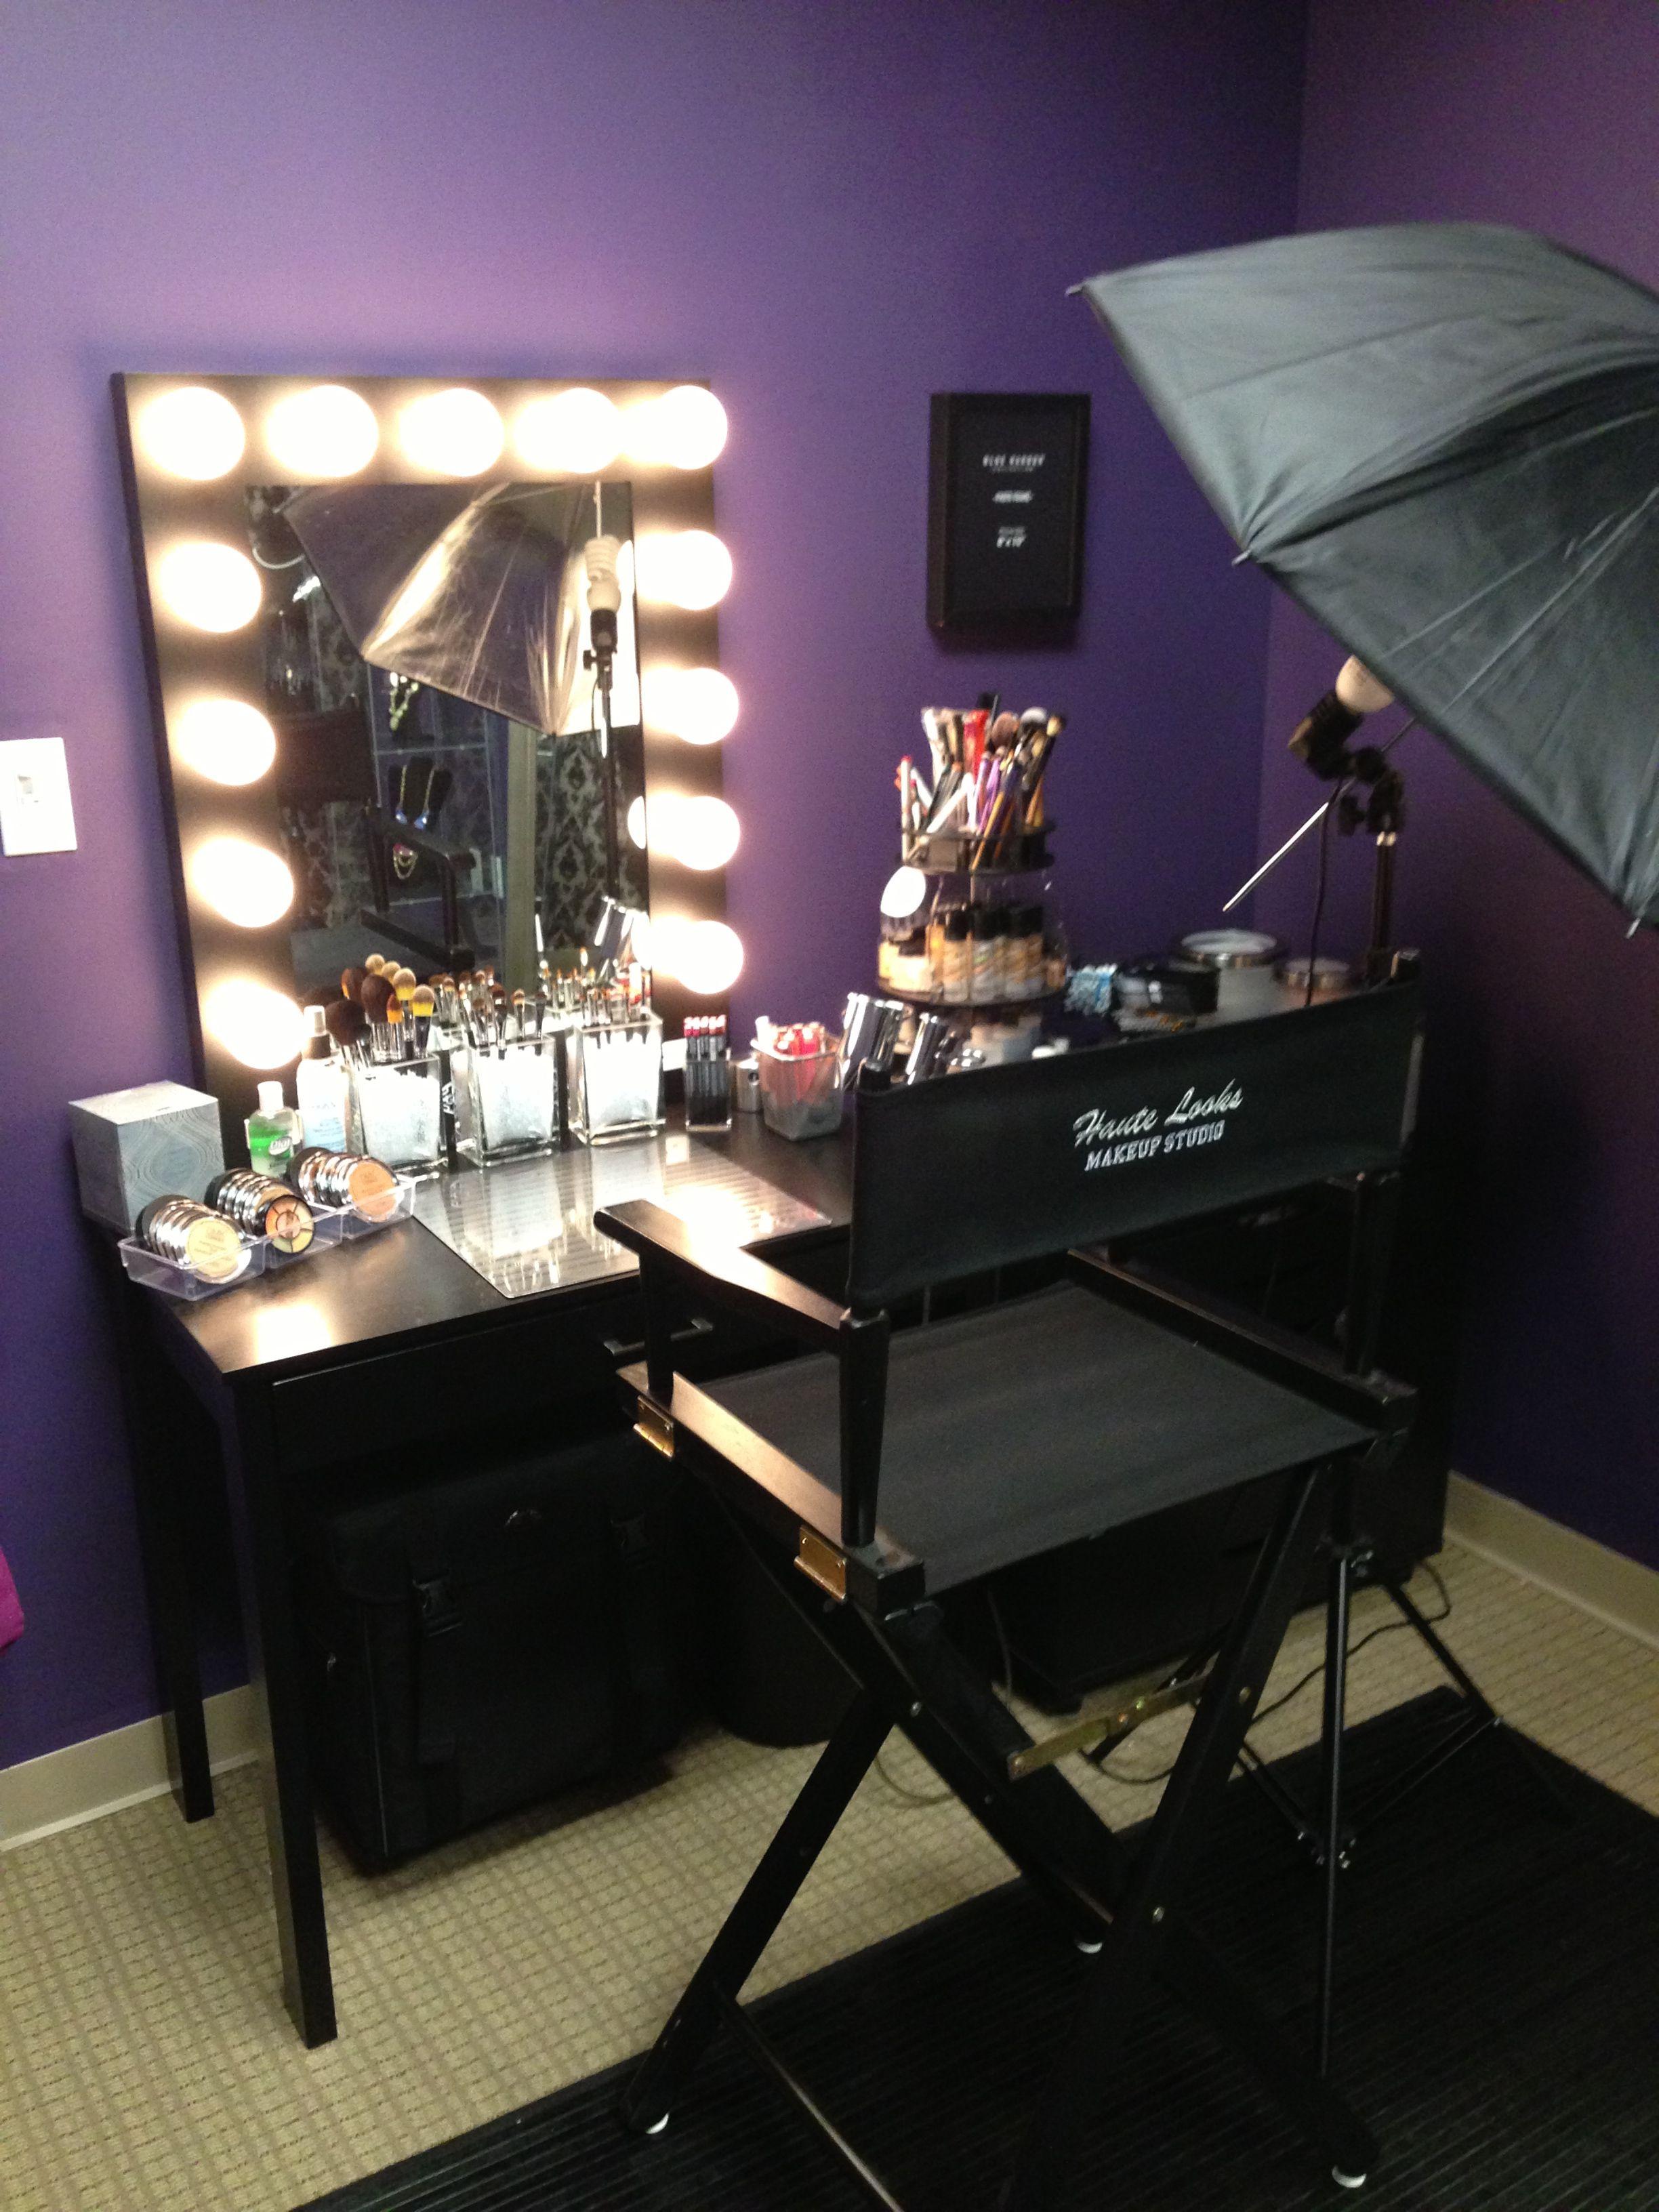 Makeup studio Makeup studio, Artist studio decor, Makeup